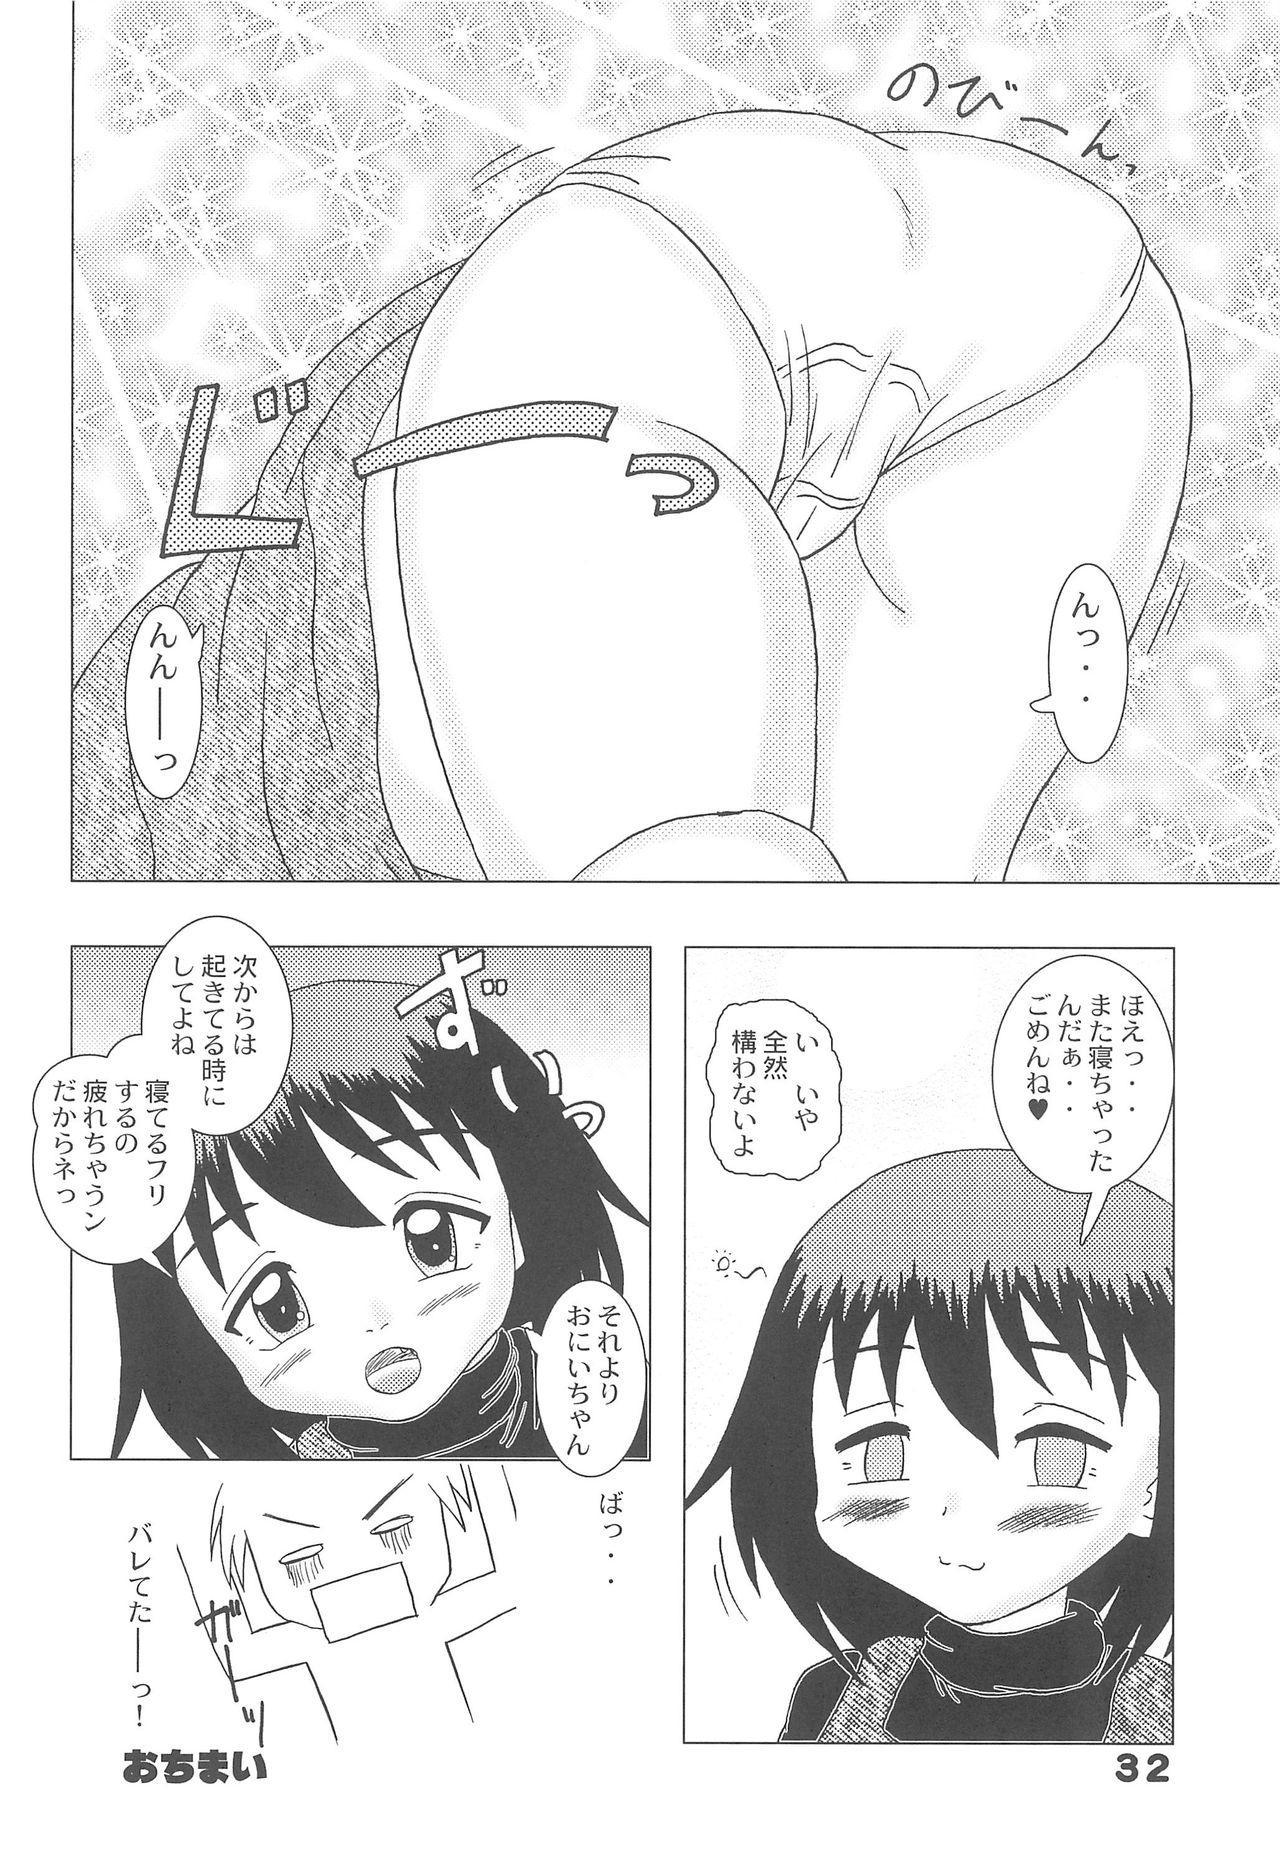 Itazura Tenshi 31